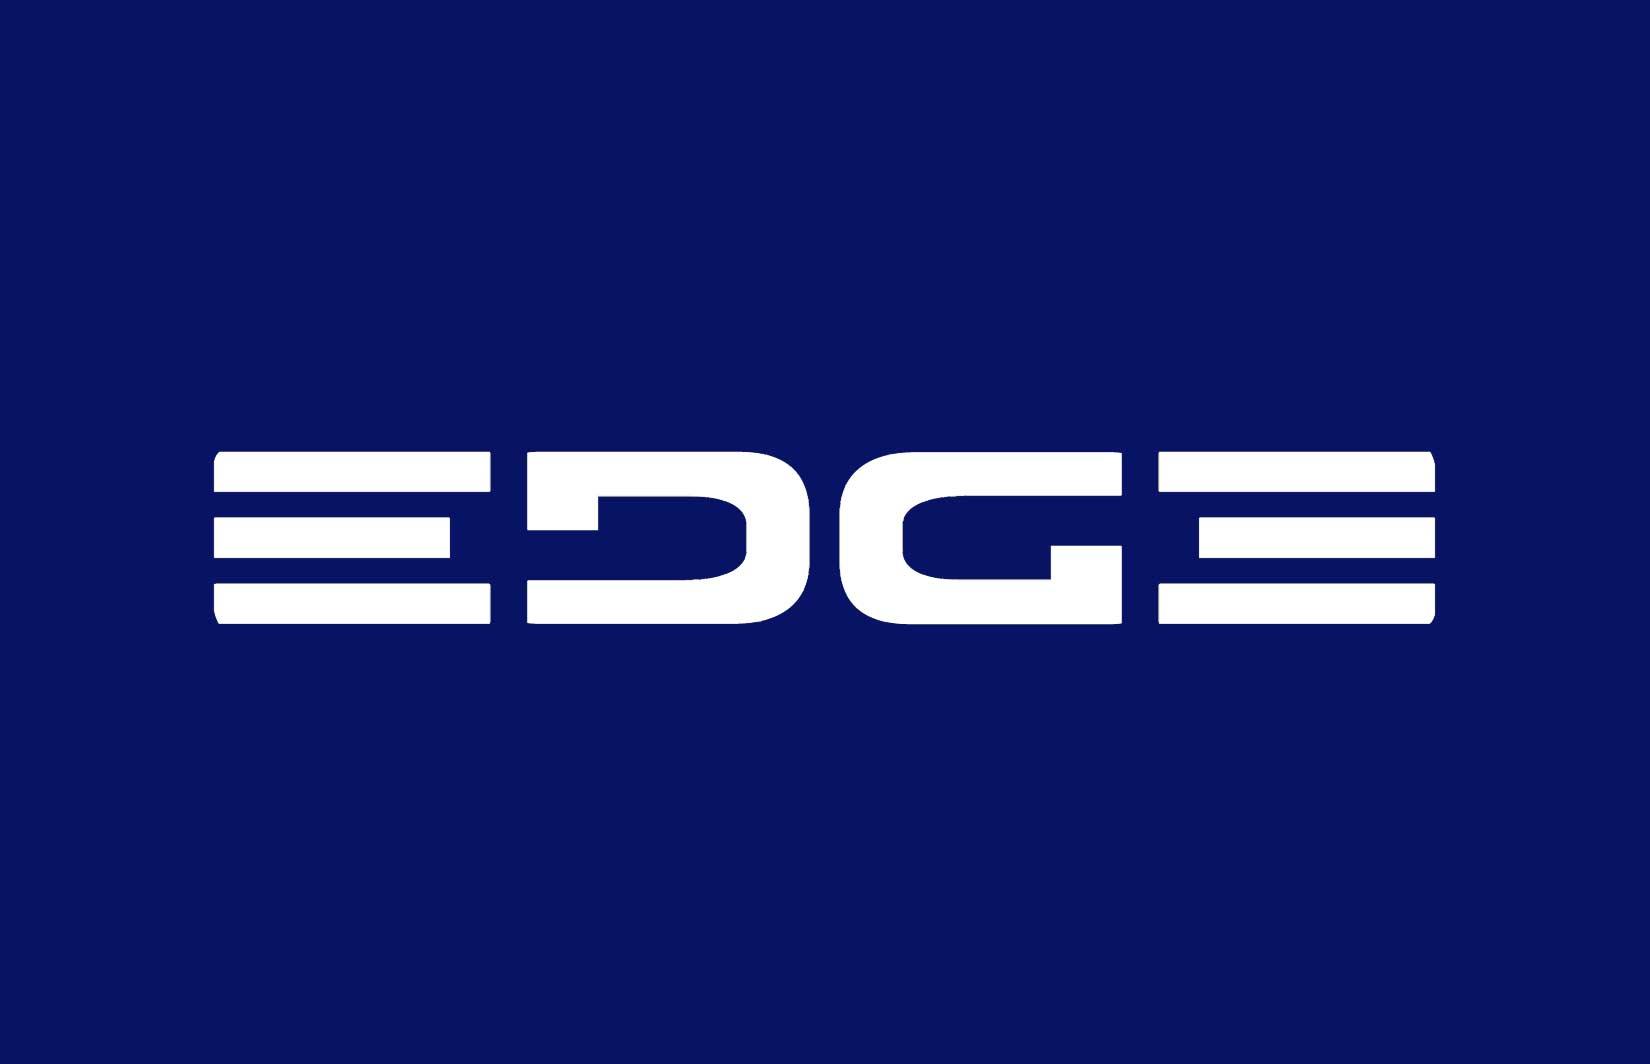 Ford Edge Ambigram Logo